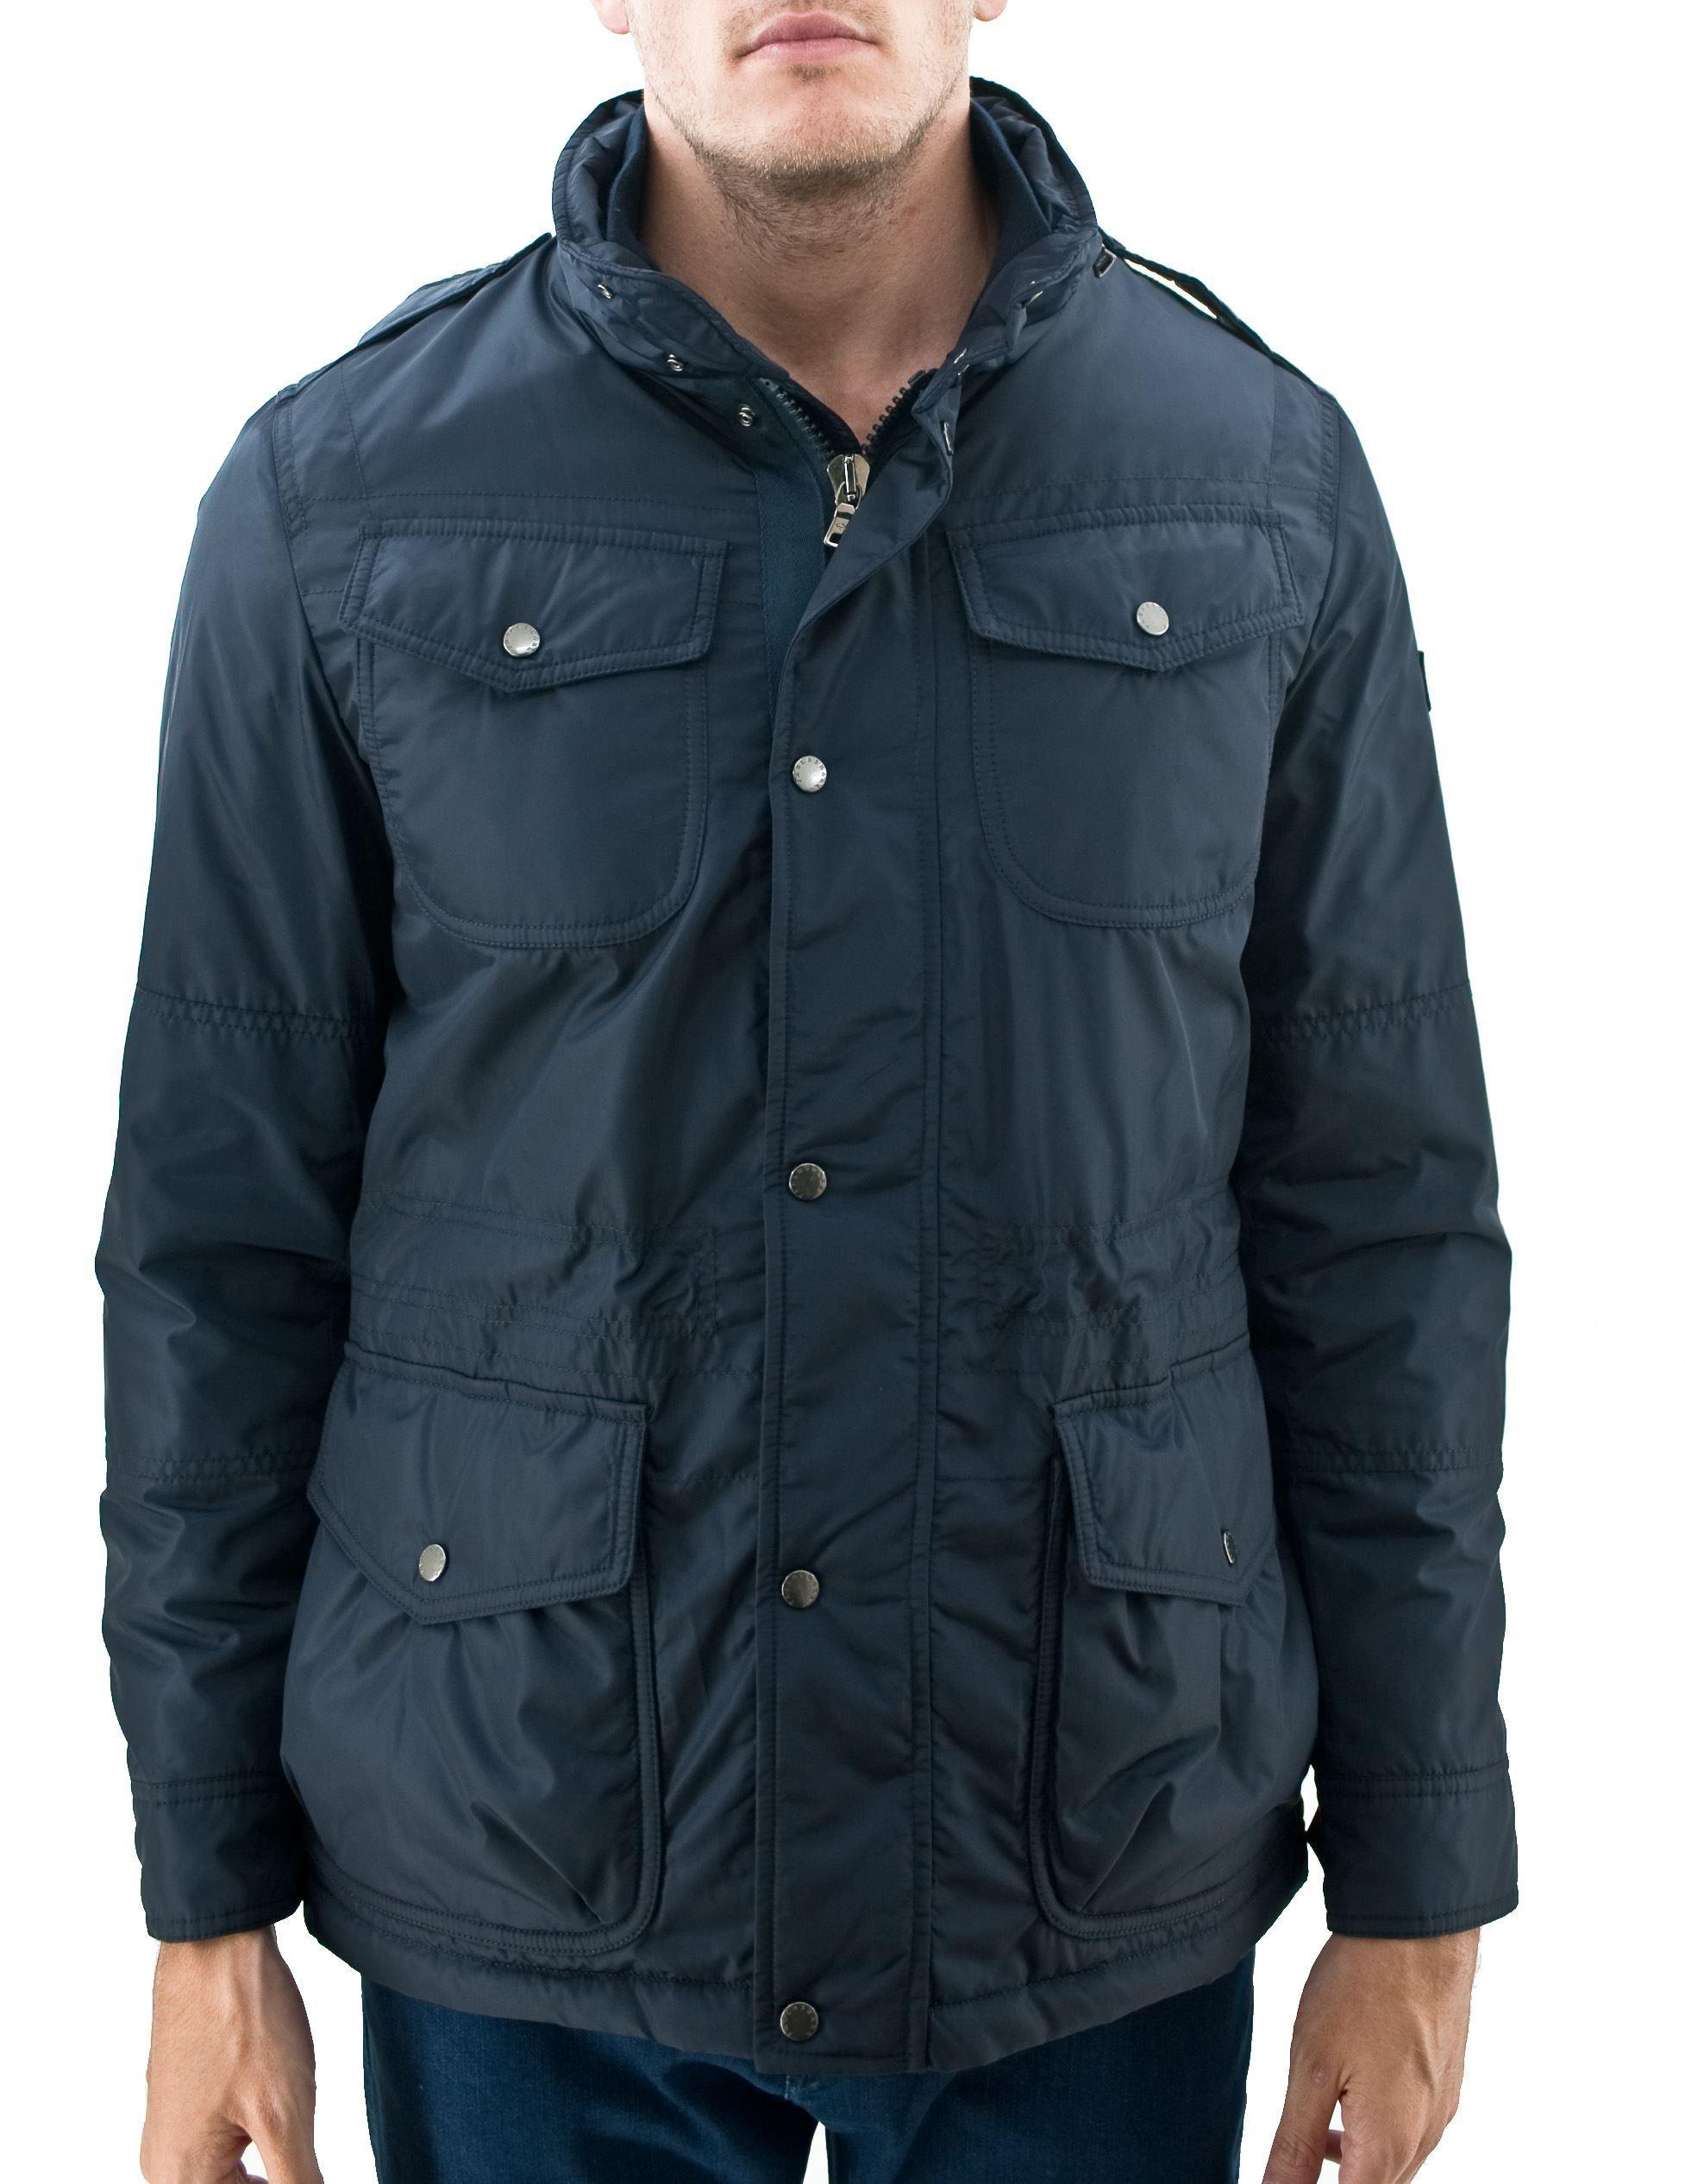 special for shoe outlet online shop Waterproof Jacket Blue